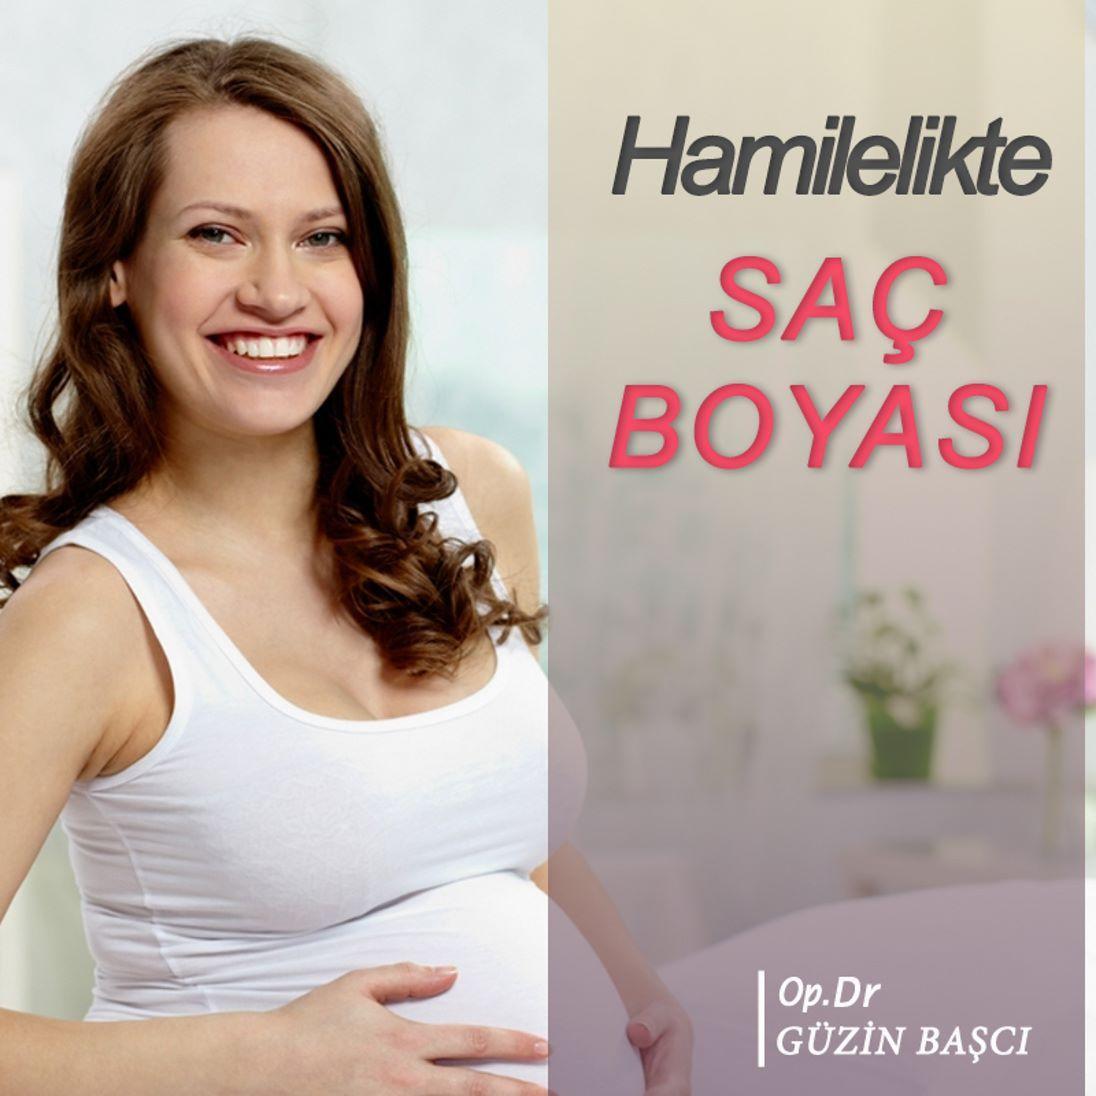 Hamilelikte Sac Boyasi Hamilelikte Sac Boyasinin Bebege Zarar